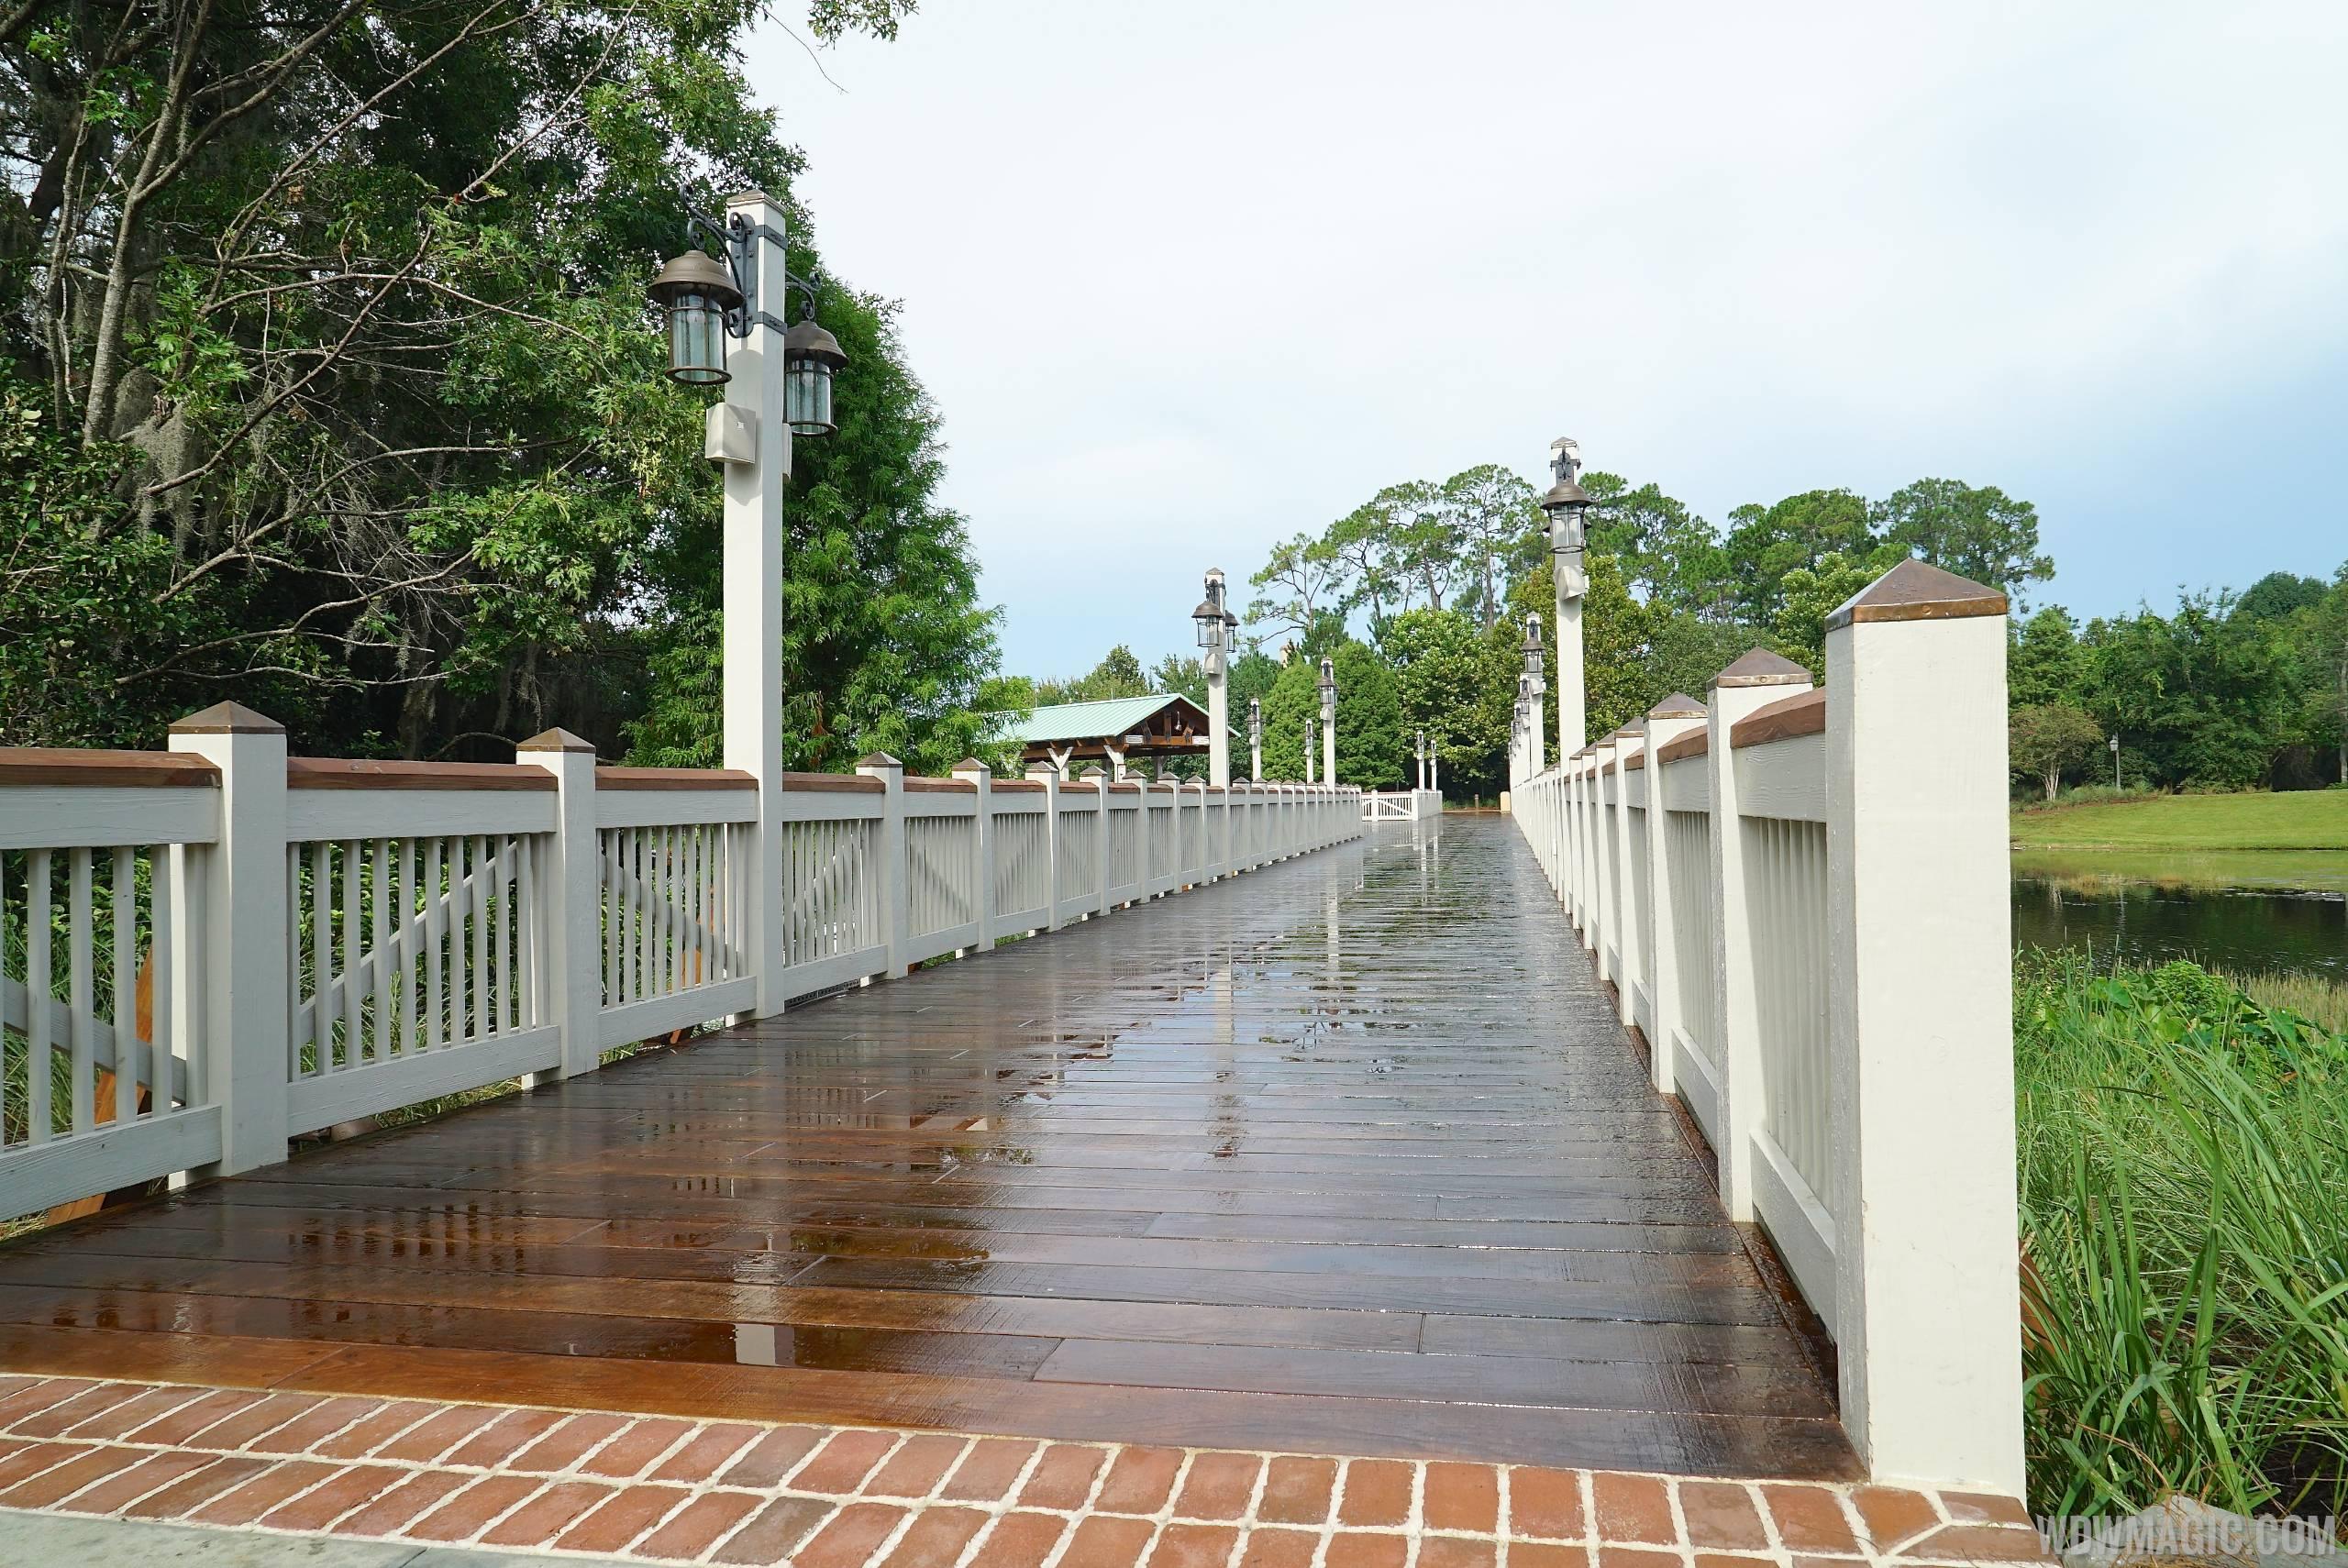 The new Marketplace bridge and dock